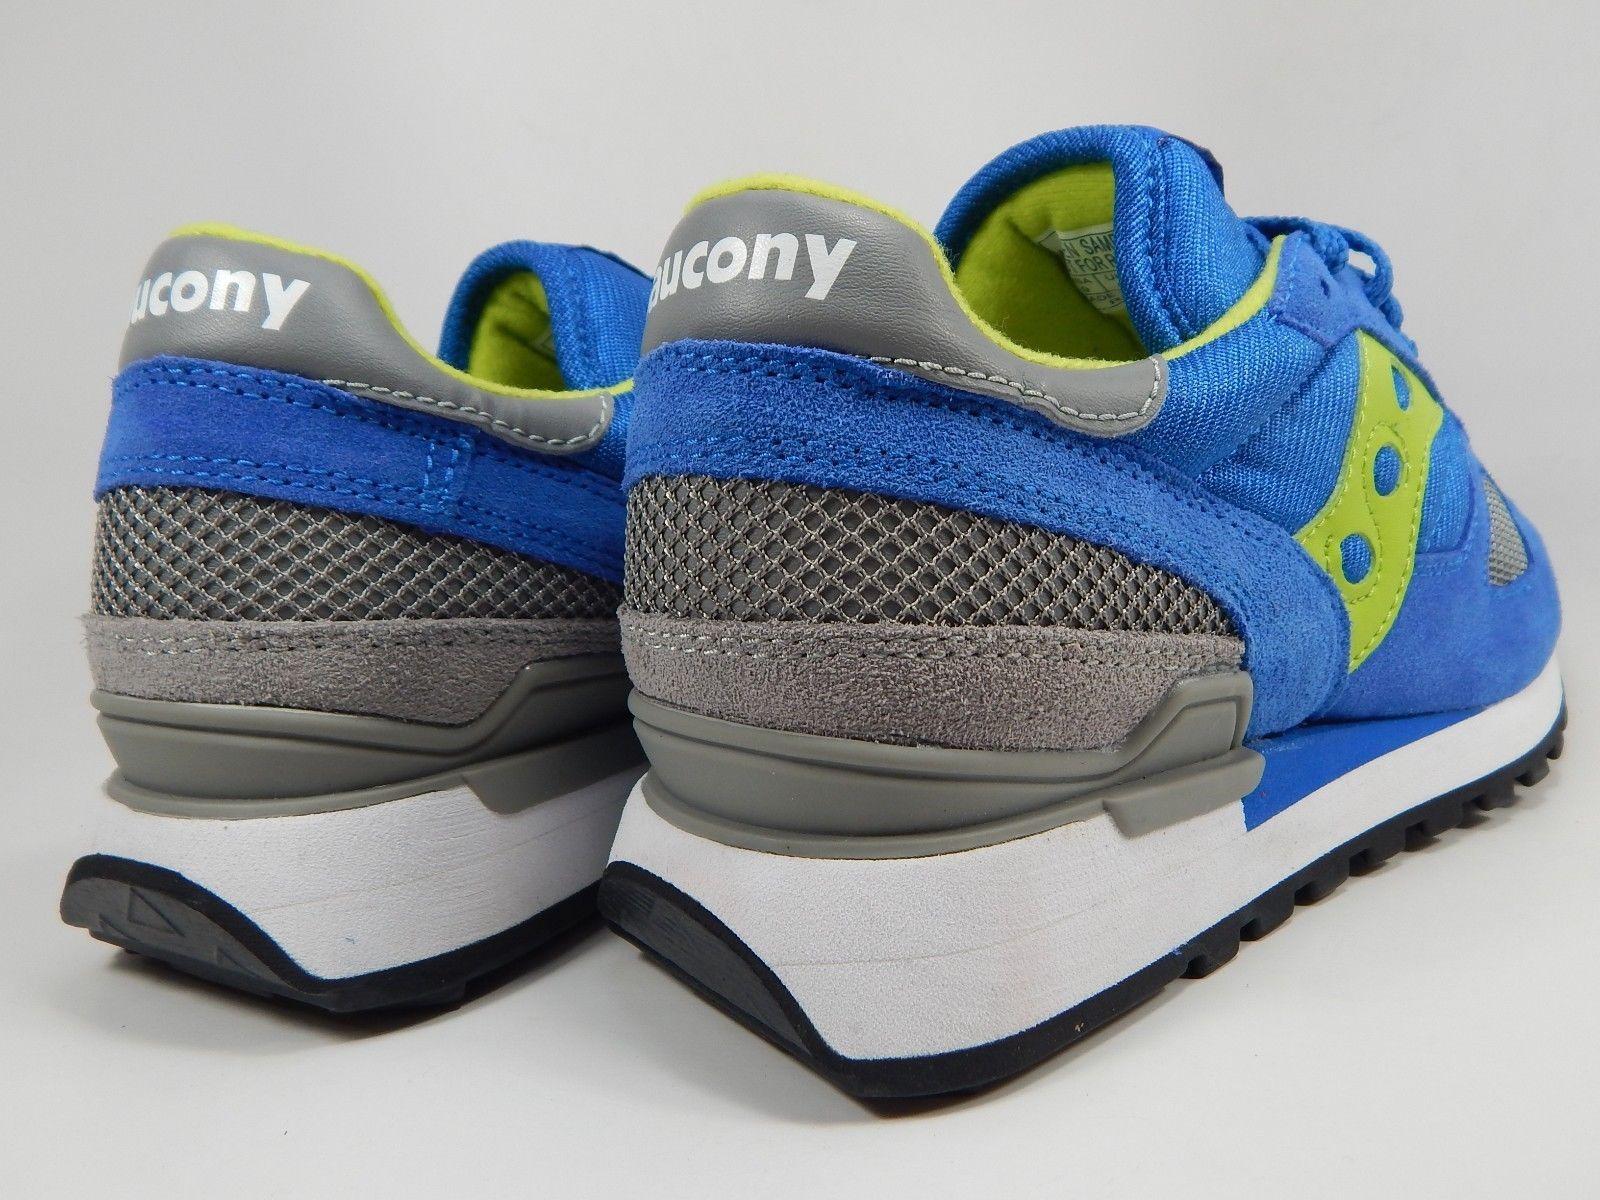 Saucony Shadow Original Men's Running Shoes Size: US 9 M (D) EU: 42.5 S2108-585